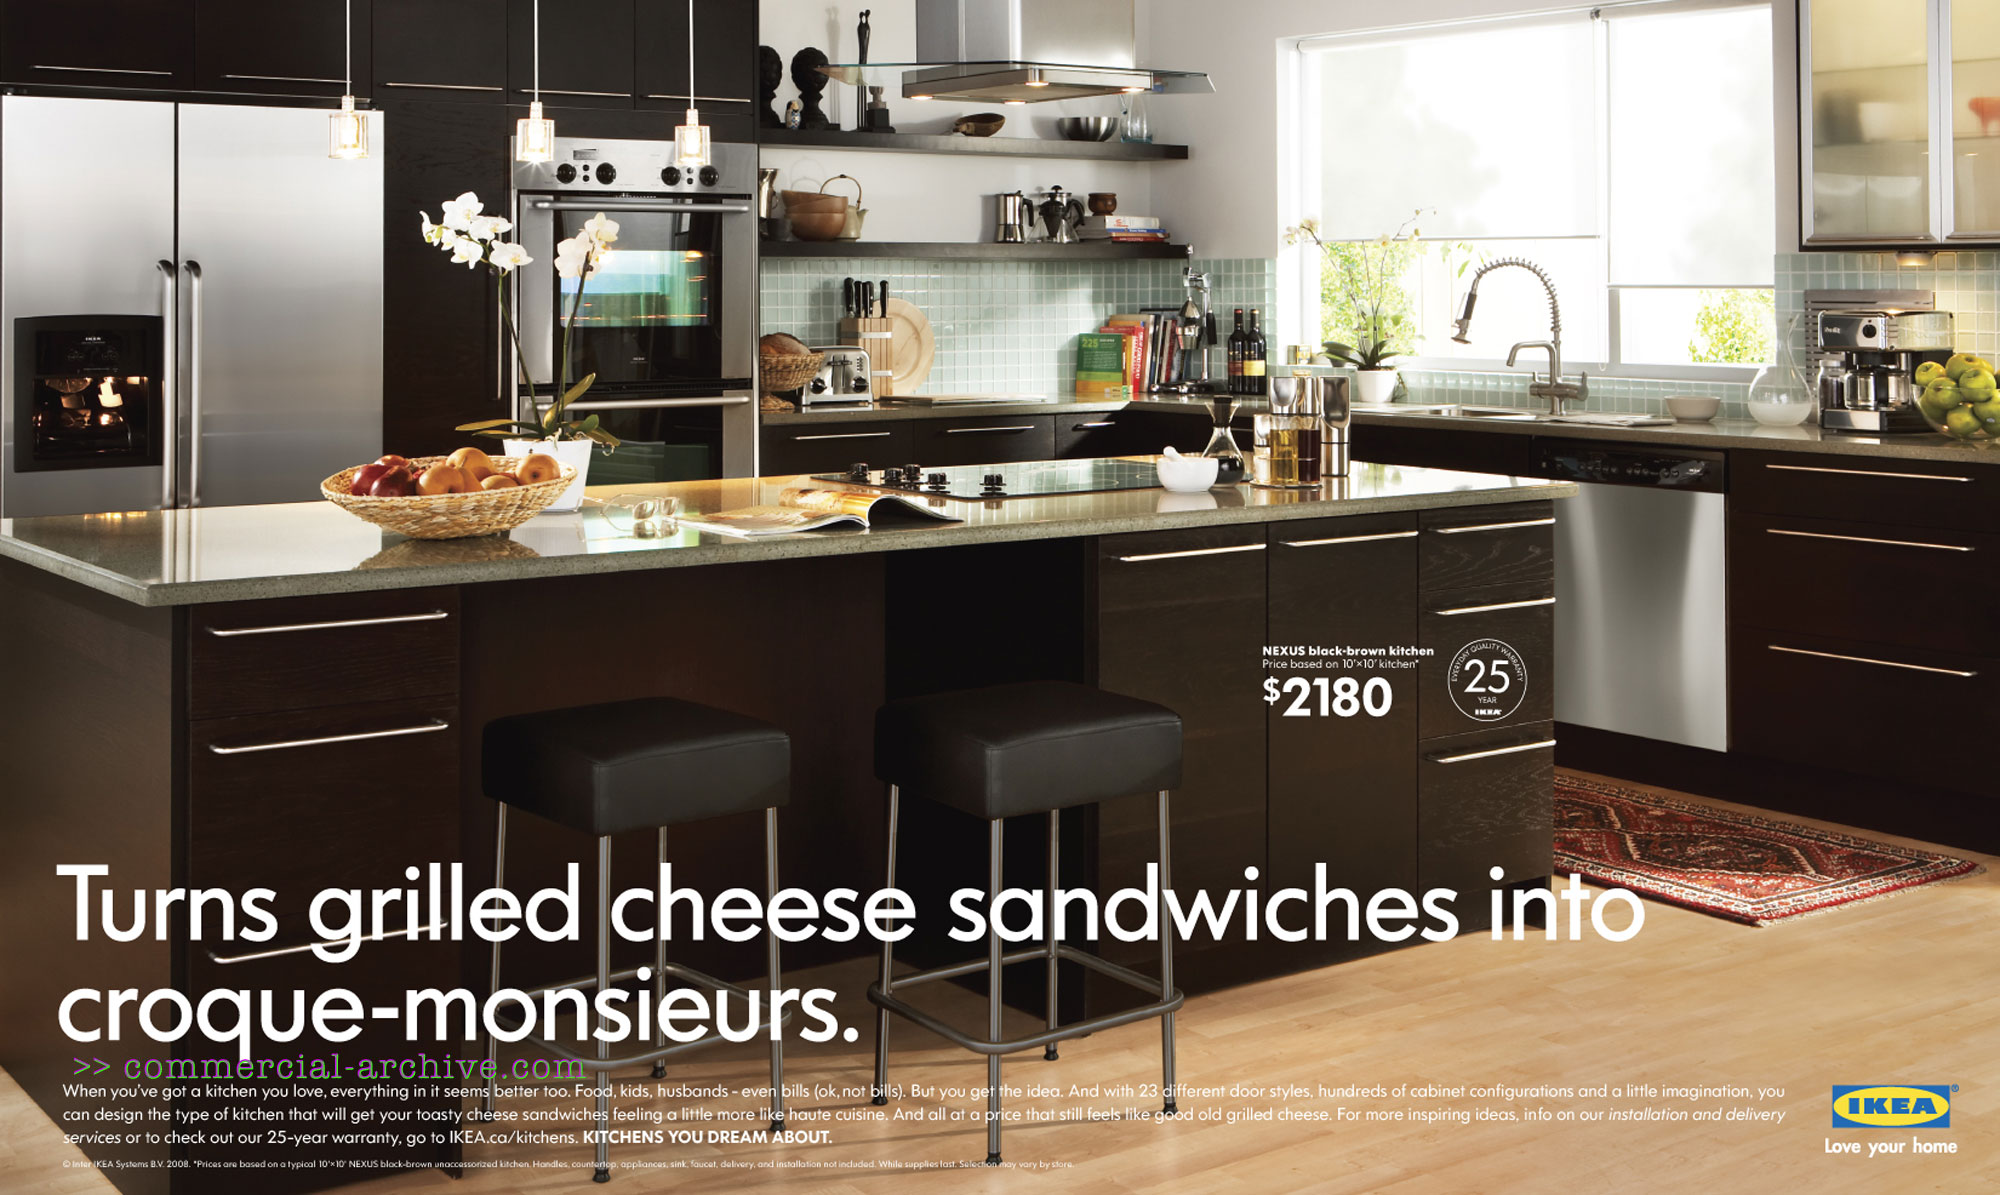 ikea kitchen ikea kitchen countertops images courtesy of IKEA